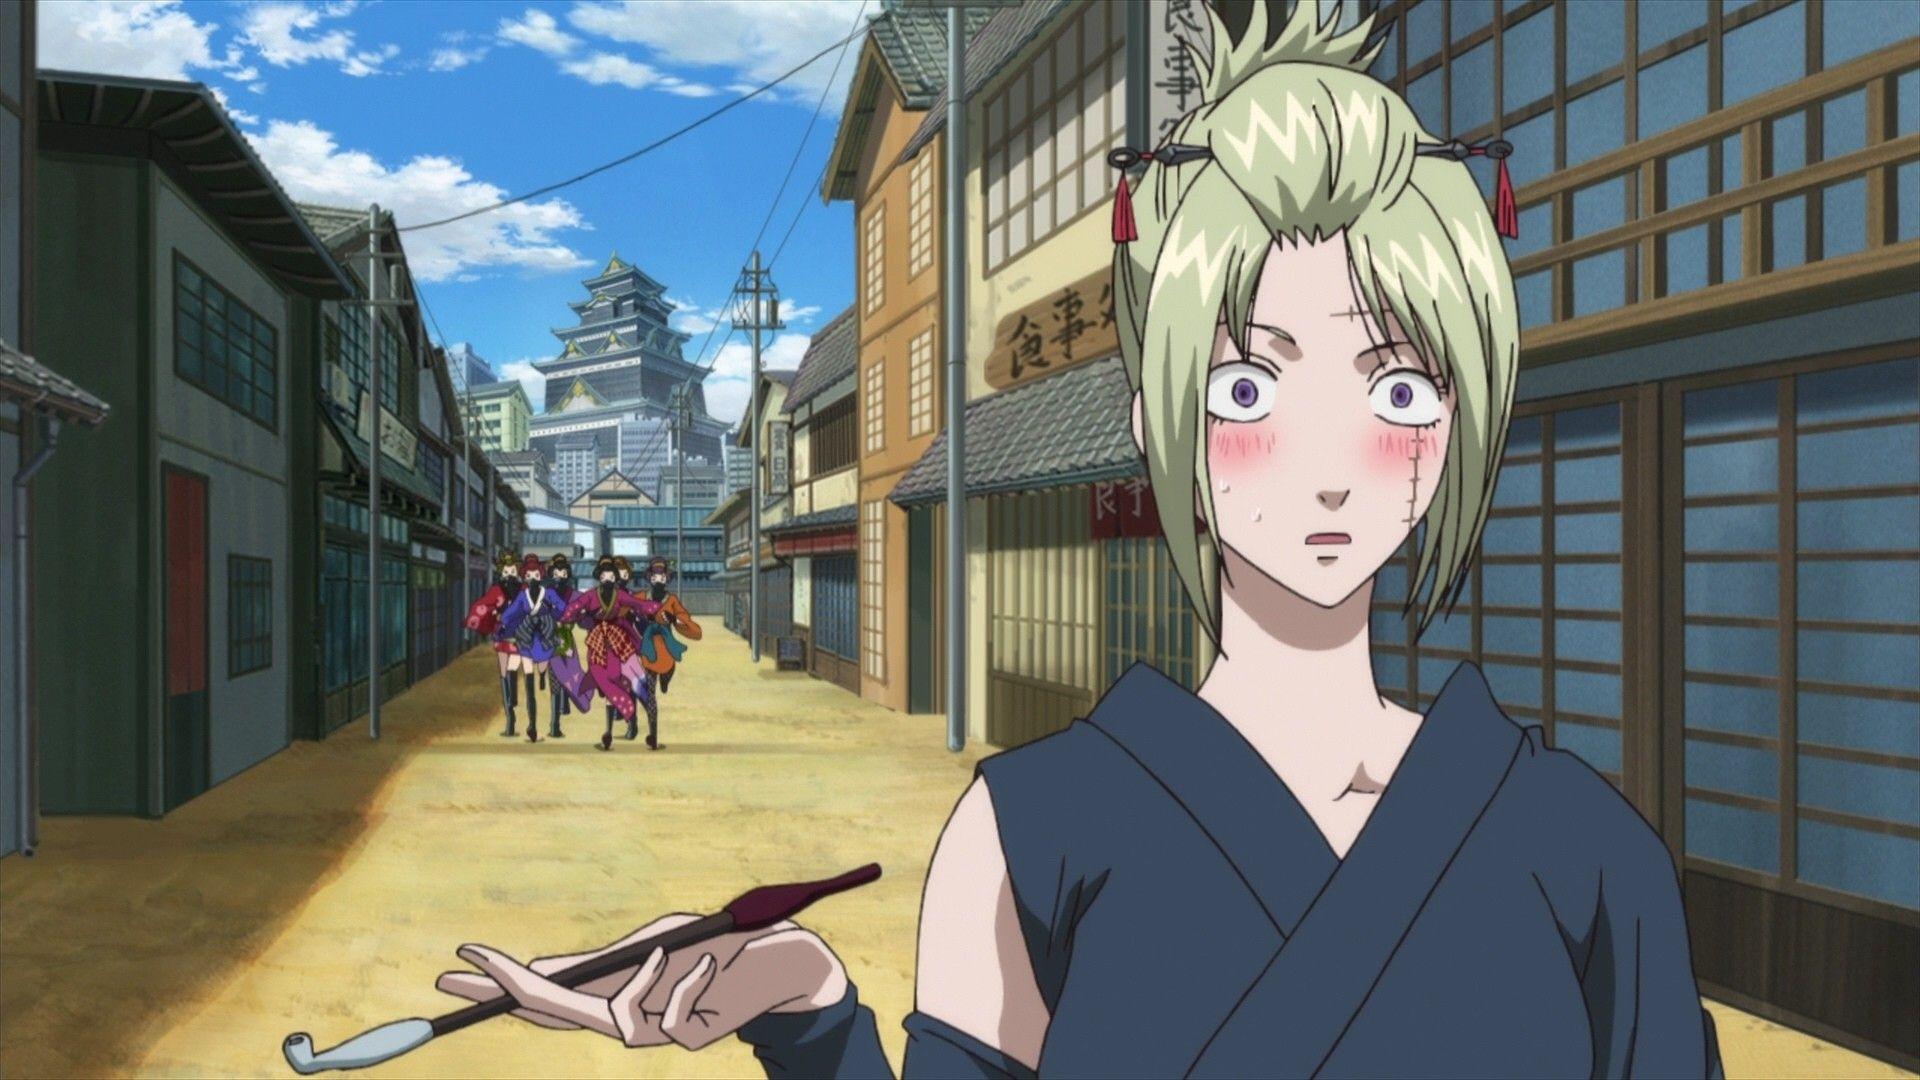 「Gintama」おしゃれまとめの人気アイデア|Pinterest|Montazerkun 漫画, 銀魂 2, 銀魂